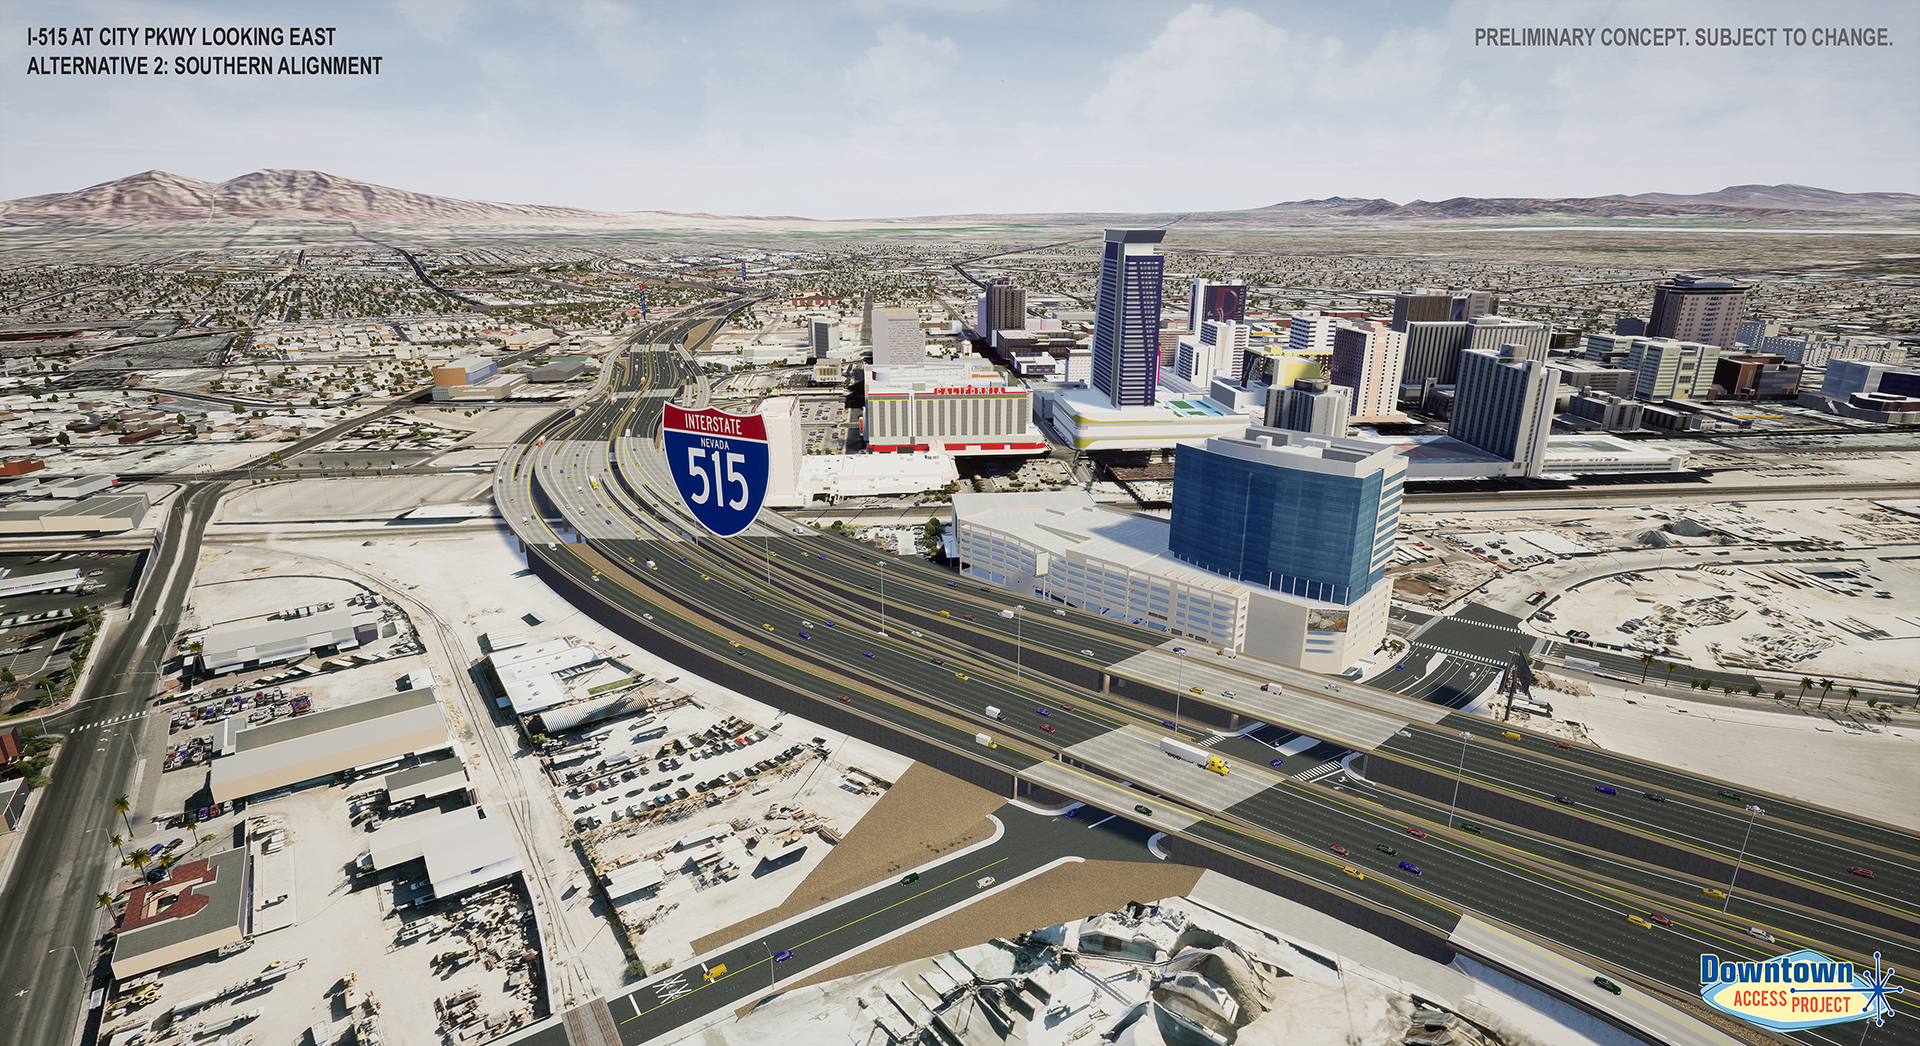 I-515 near city parkway alternative 2 rendering